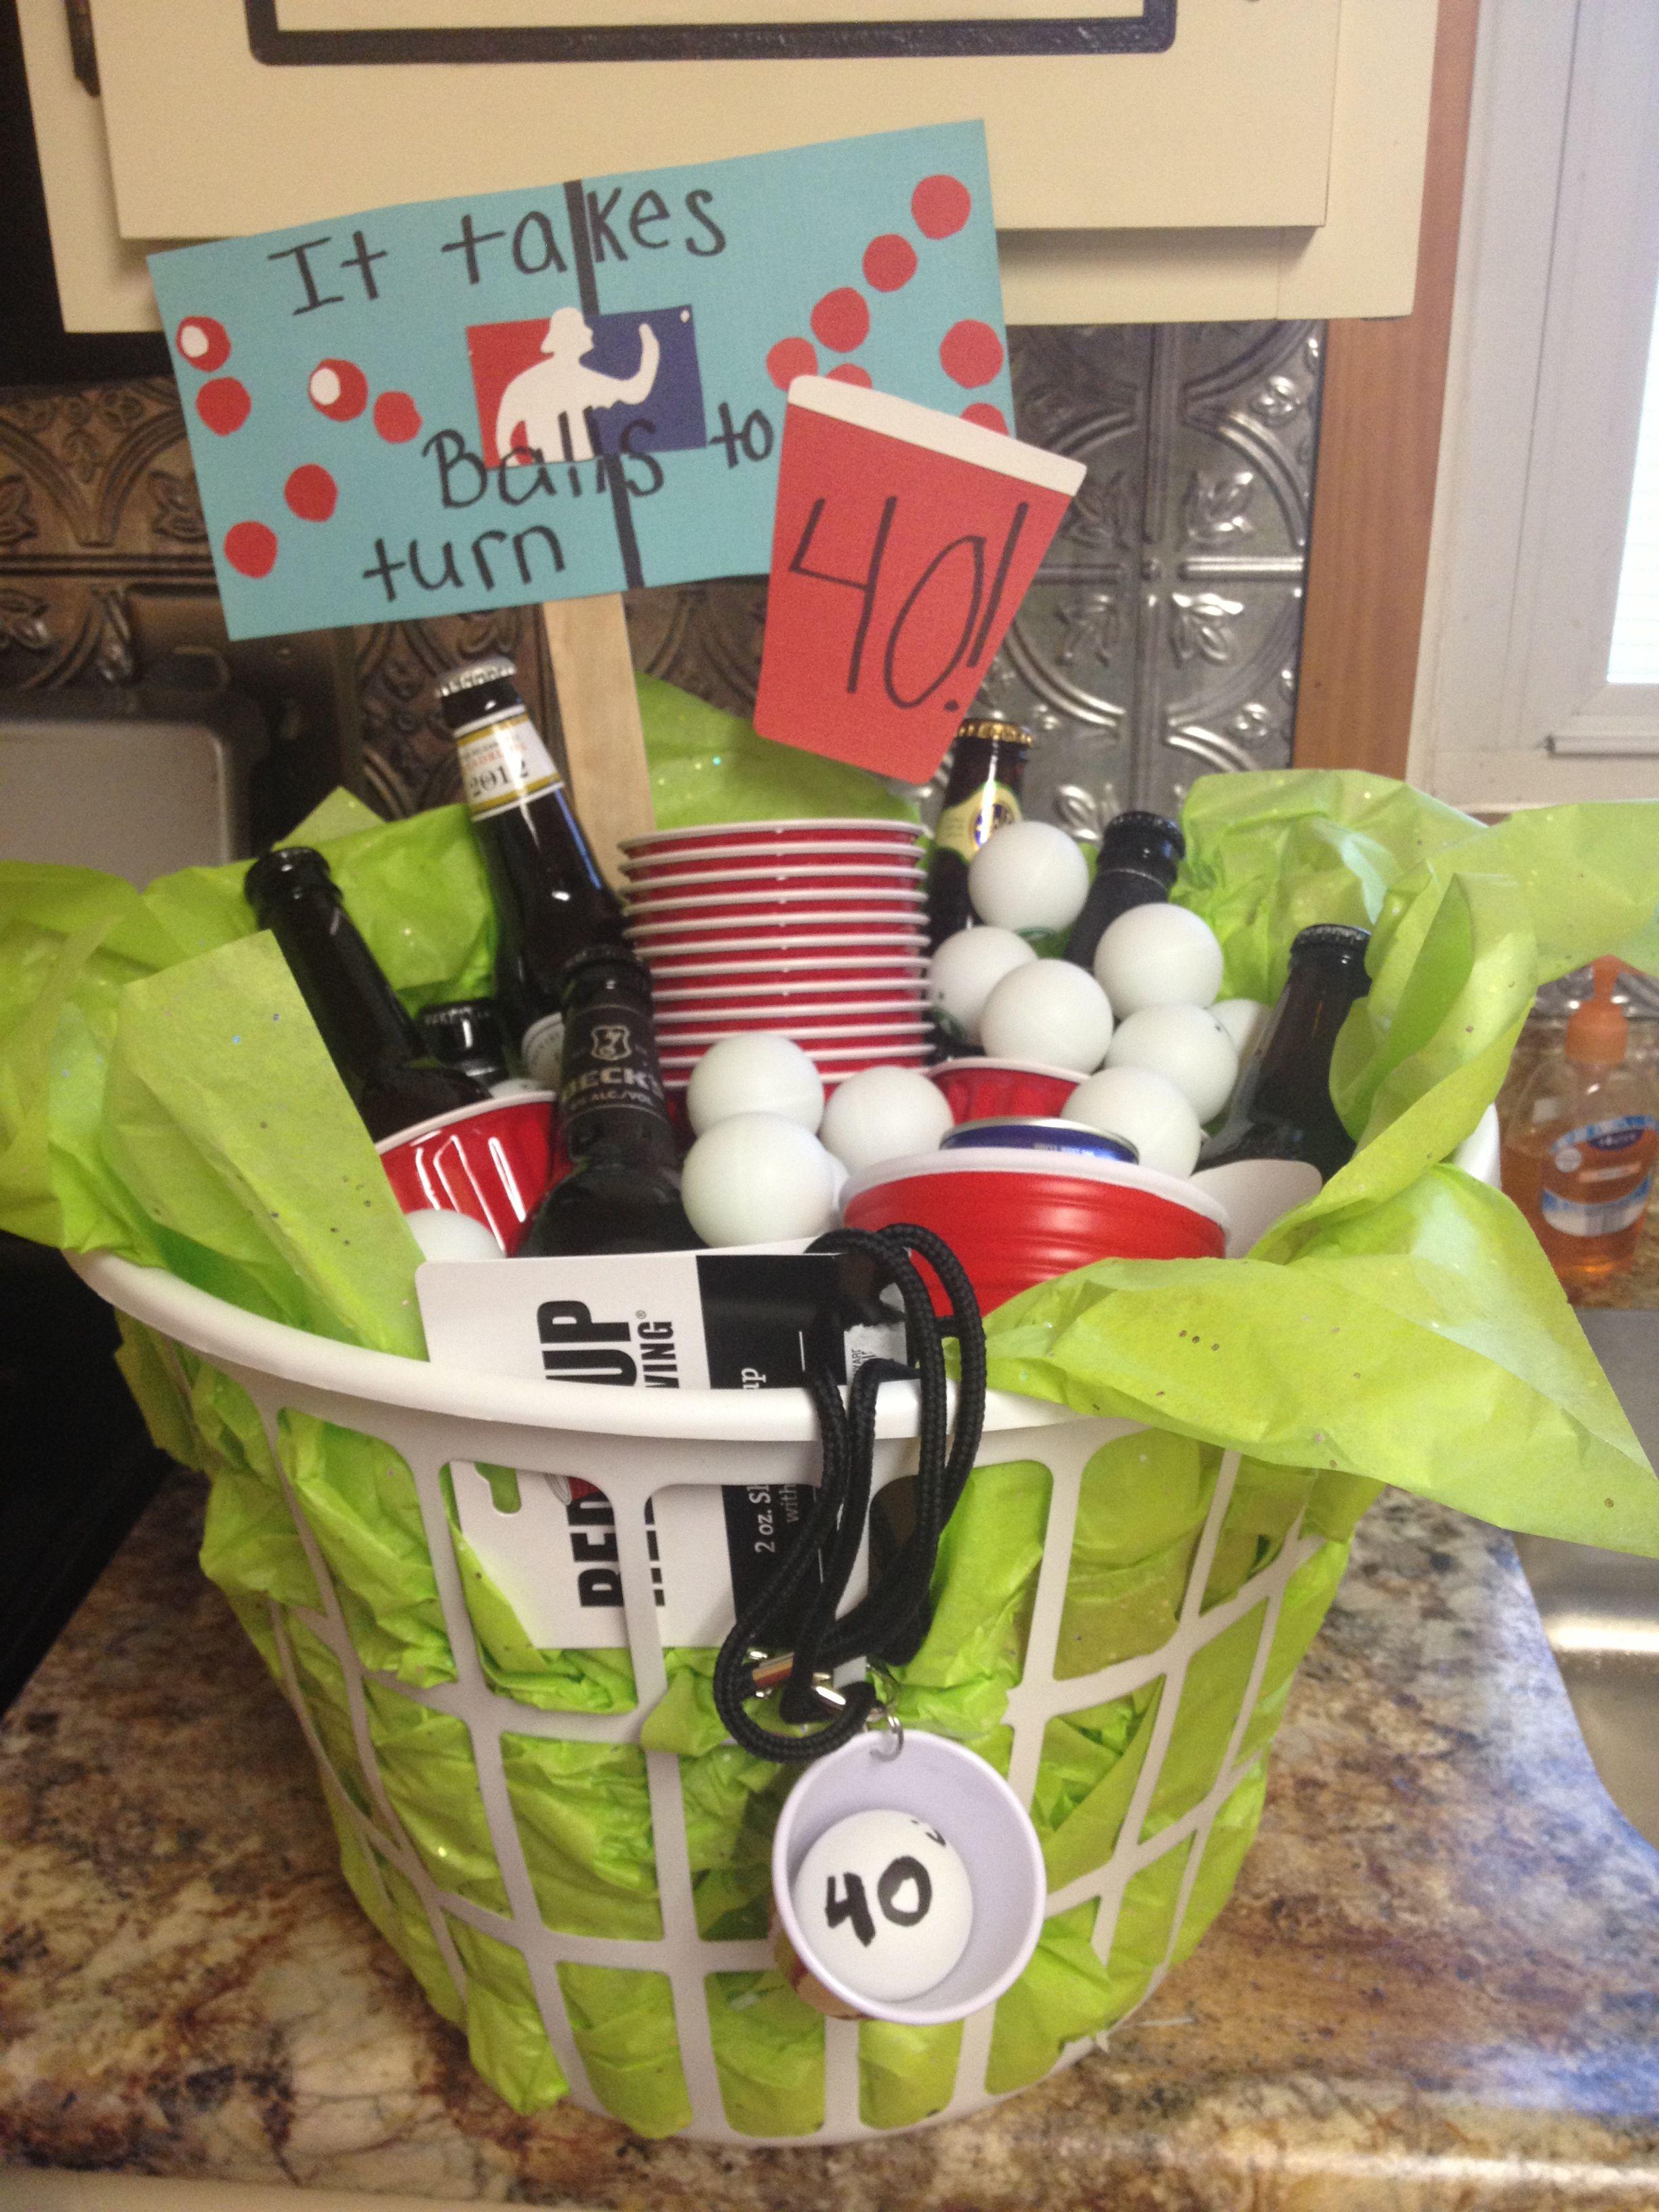 It takes balls to turn 40 beer pong gift basket diy by breezy lol guy gift it takes balls to turn beer pong gift basket negle Gallery